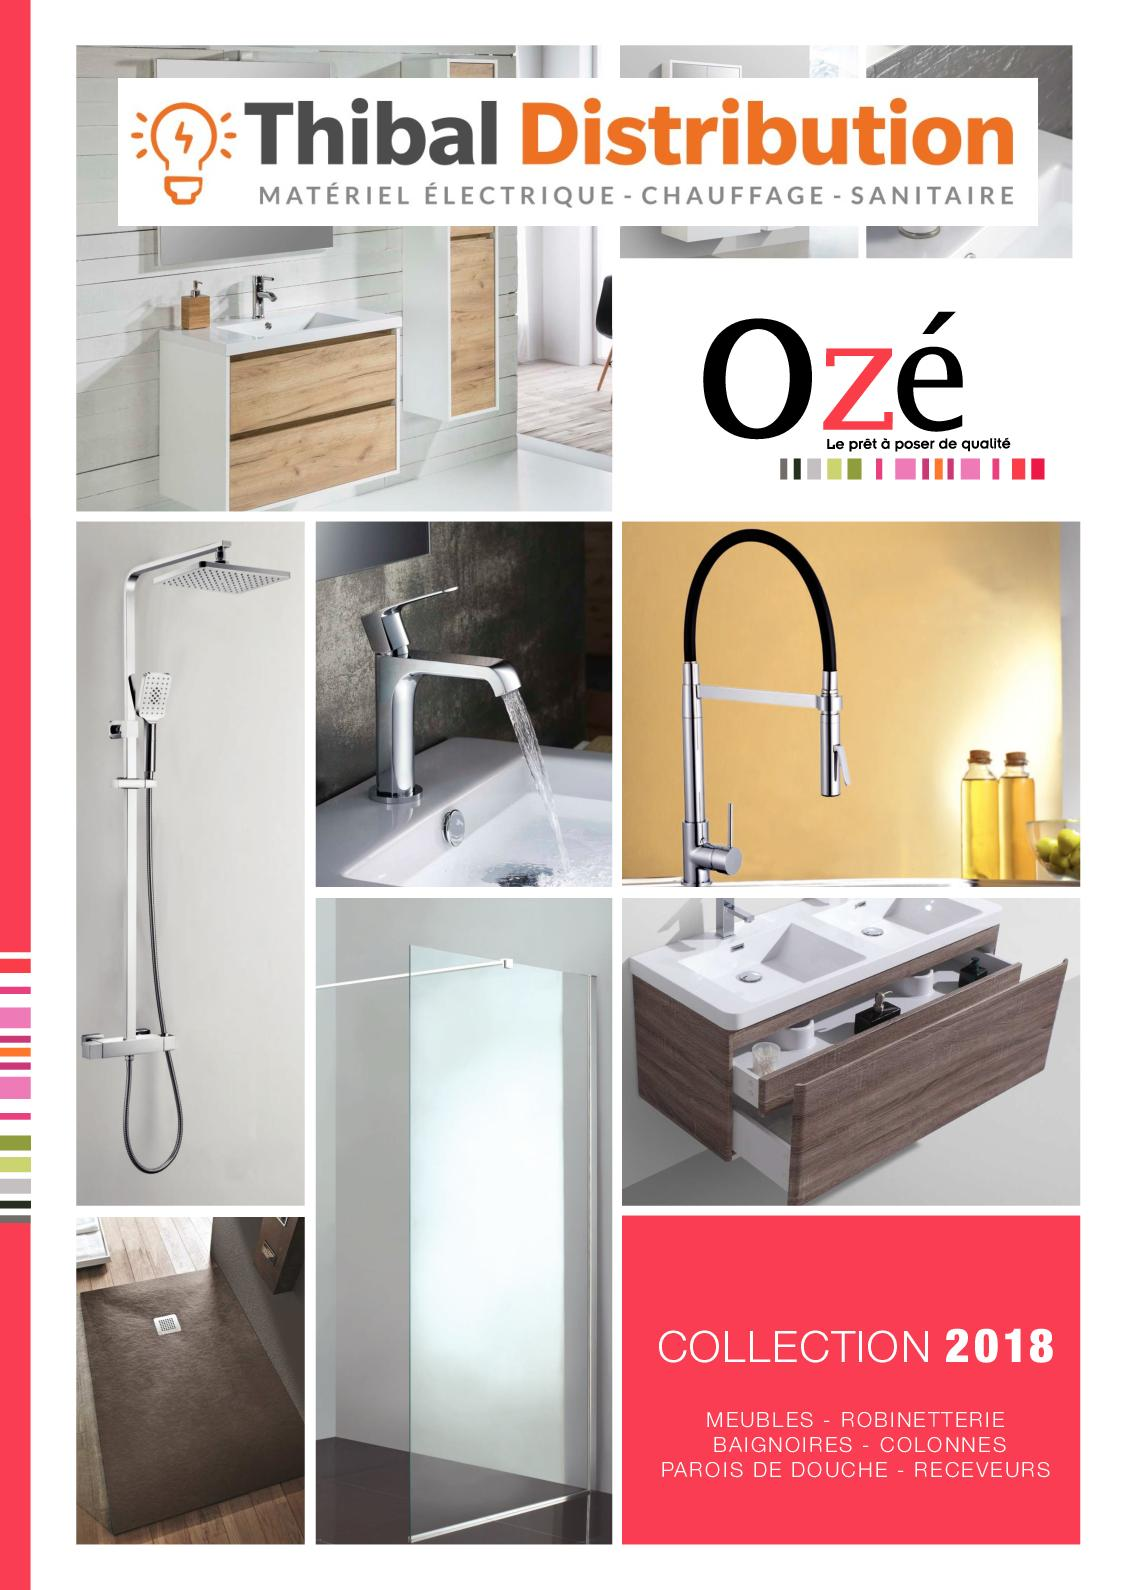 Calaméo - Catlogue Salle de bains - Oze 2018 By Thibal 7c409cb3bf84